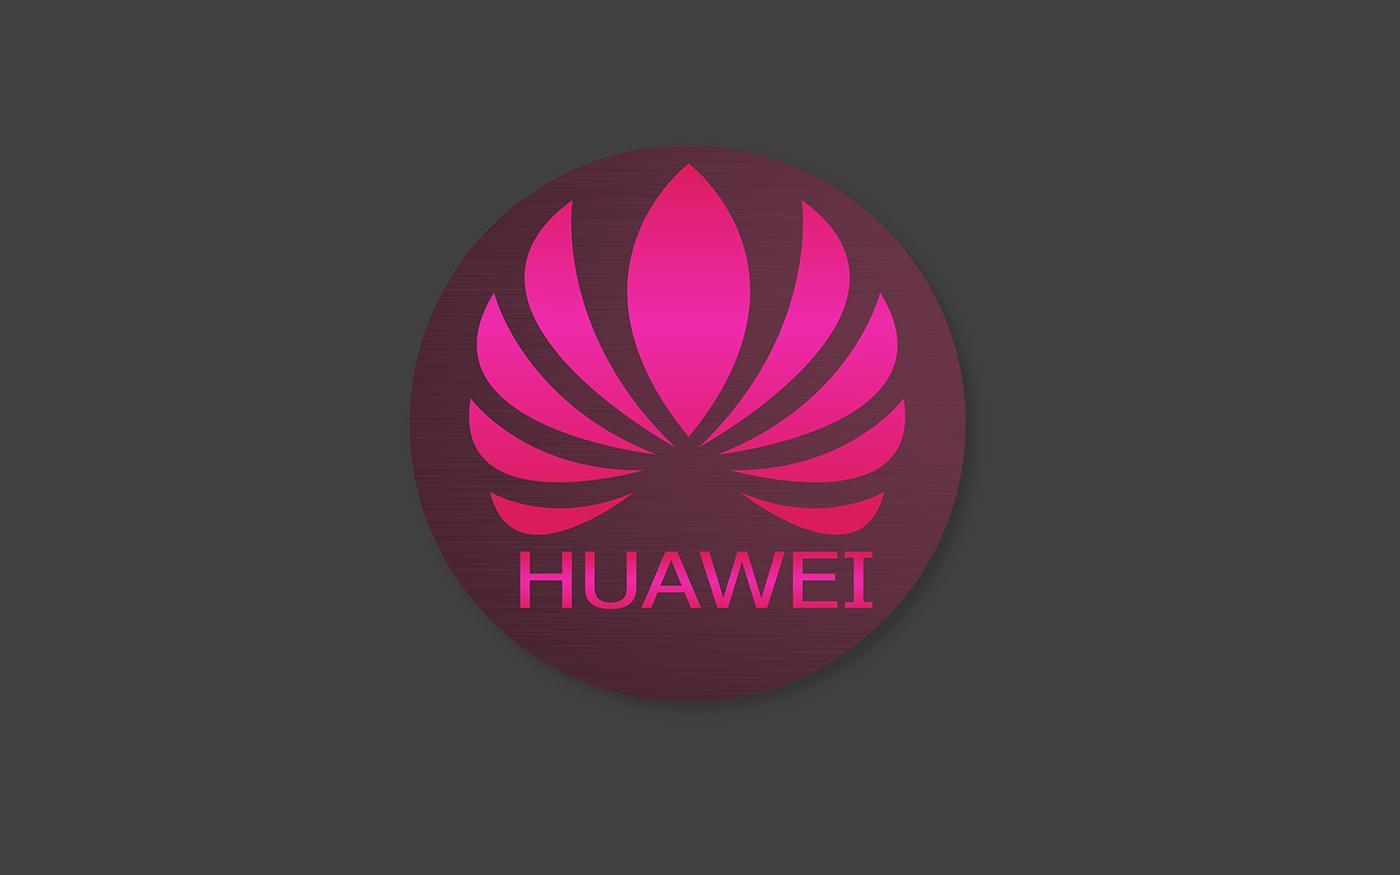 Logotipo de Huawei con fondo gris